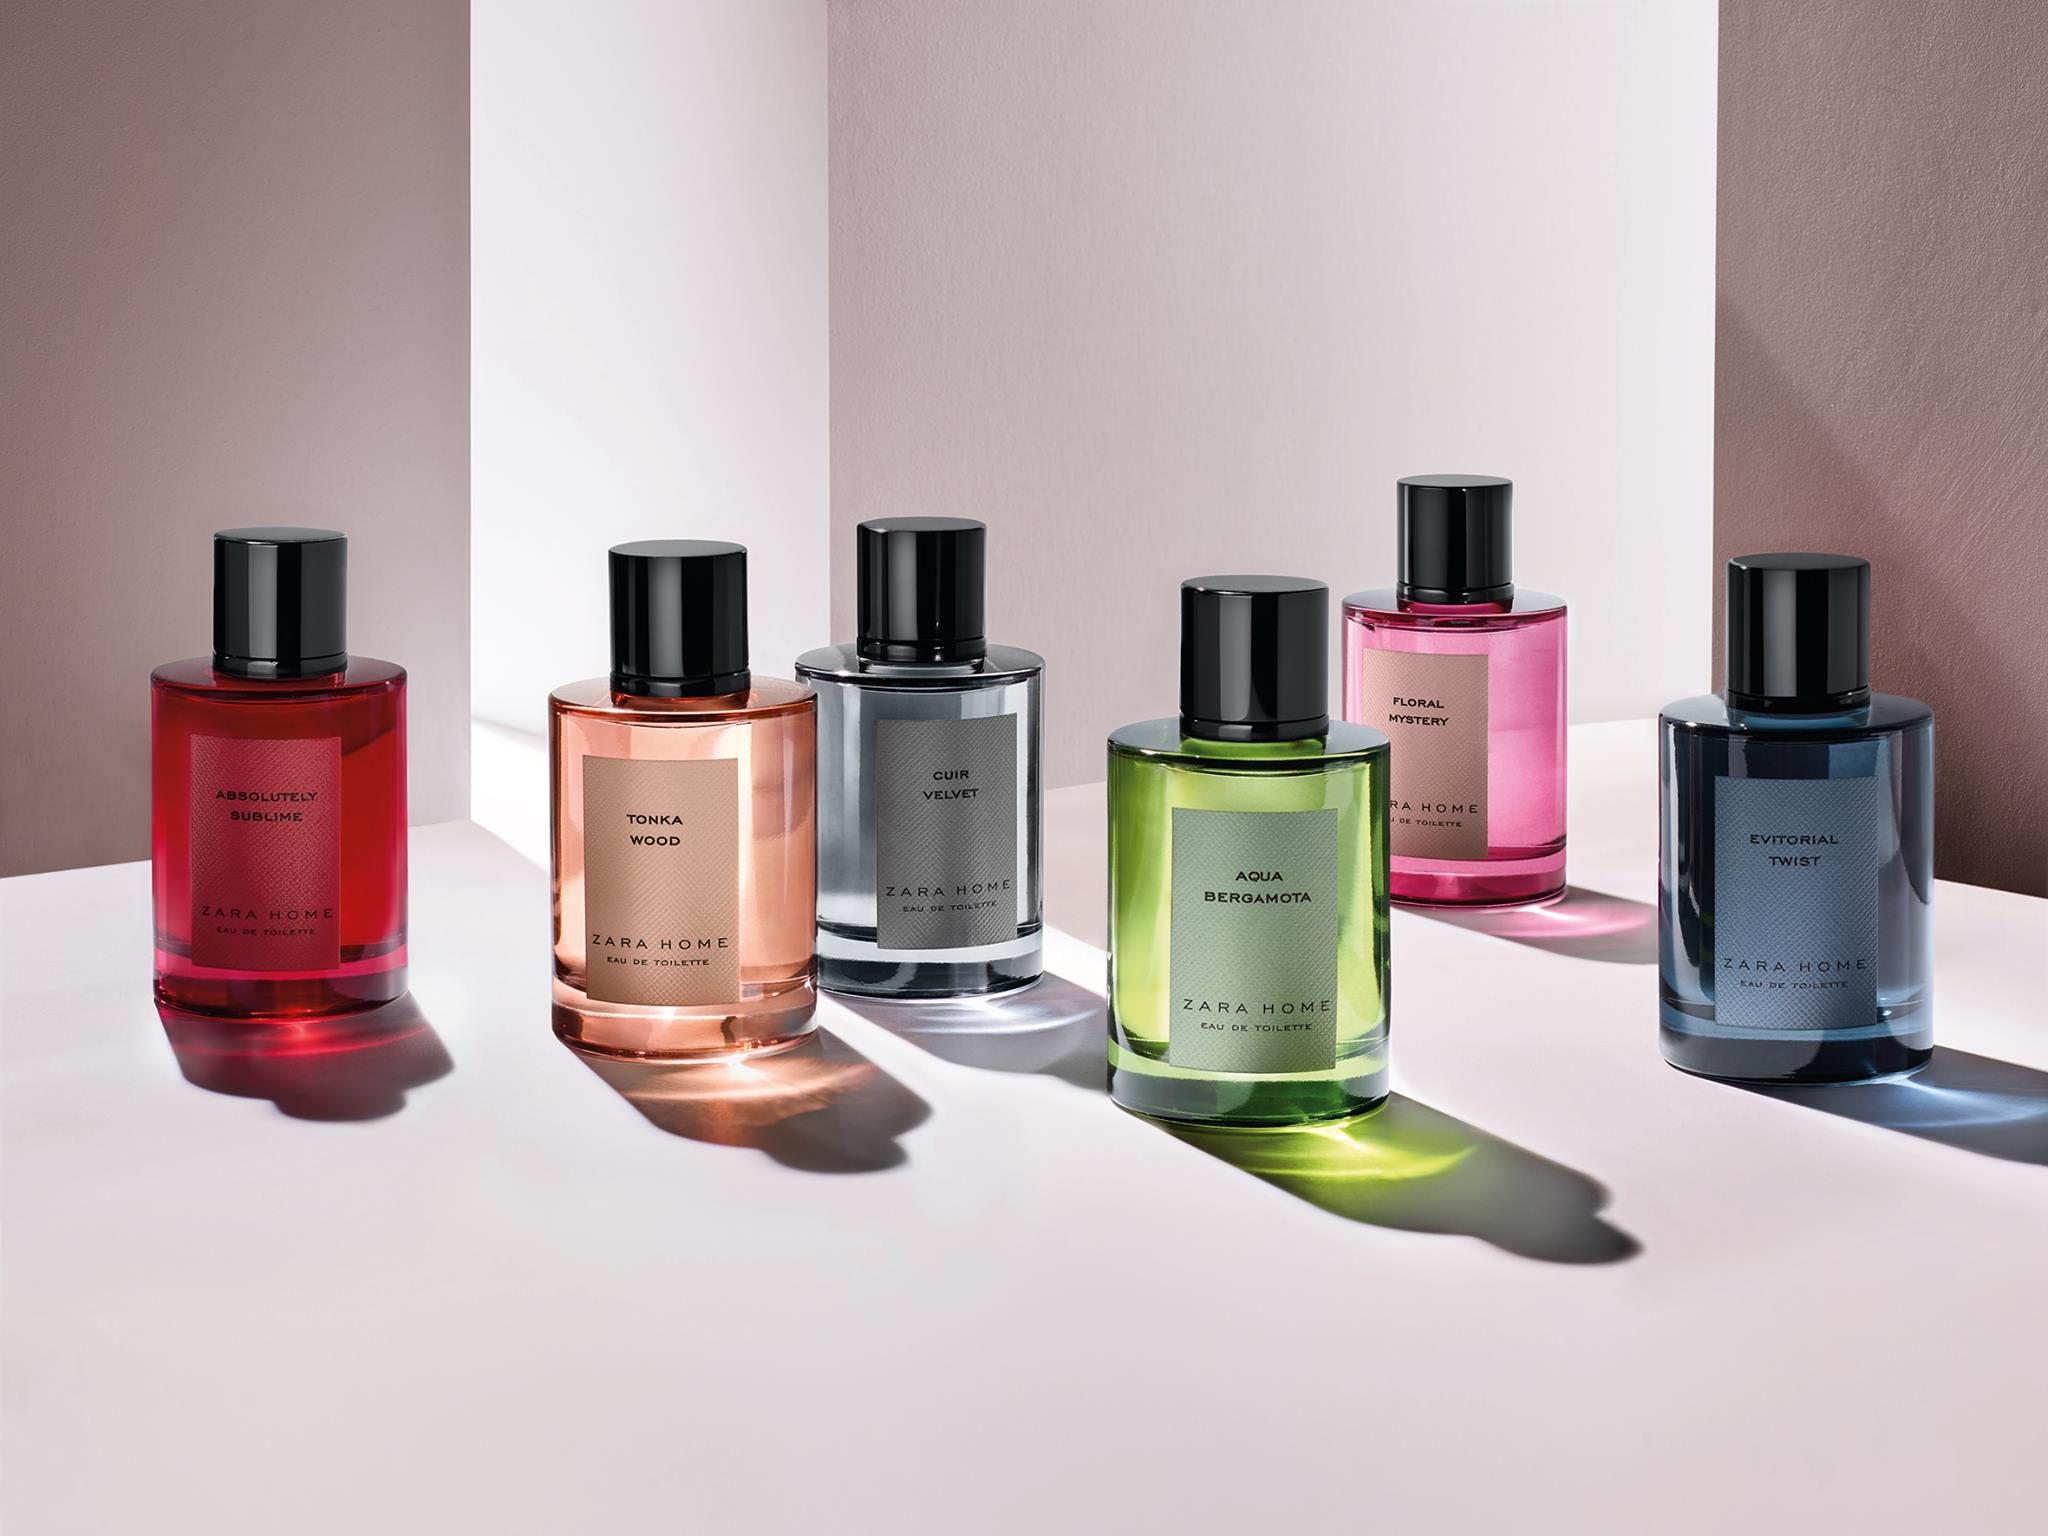 Accessoires Salle De Bain Zara Home ~ une collection de fragrances pointues et lifestyle sign s zara home